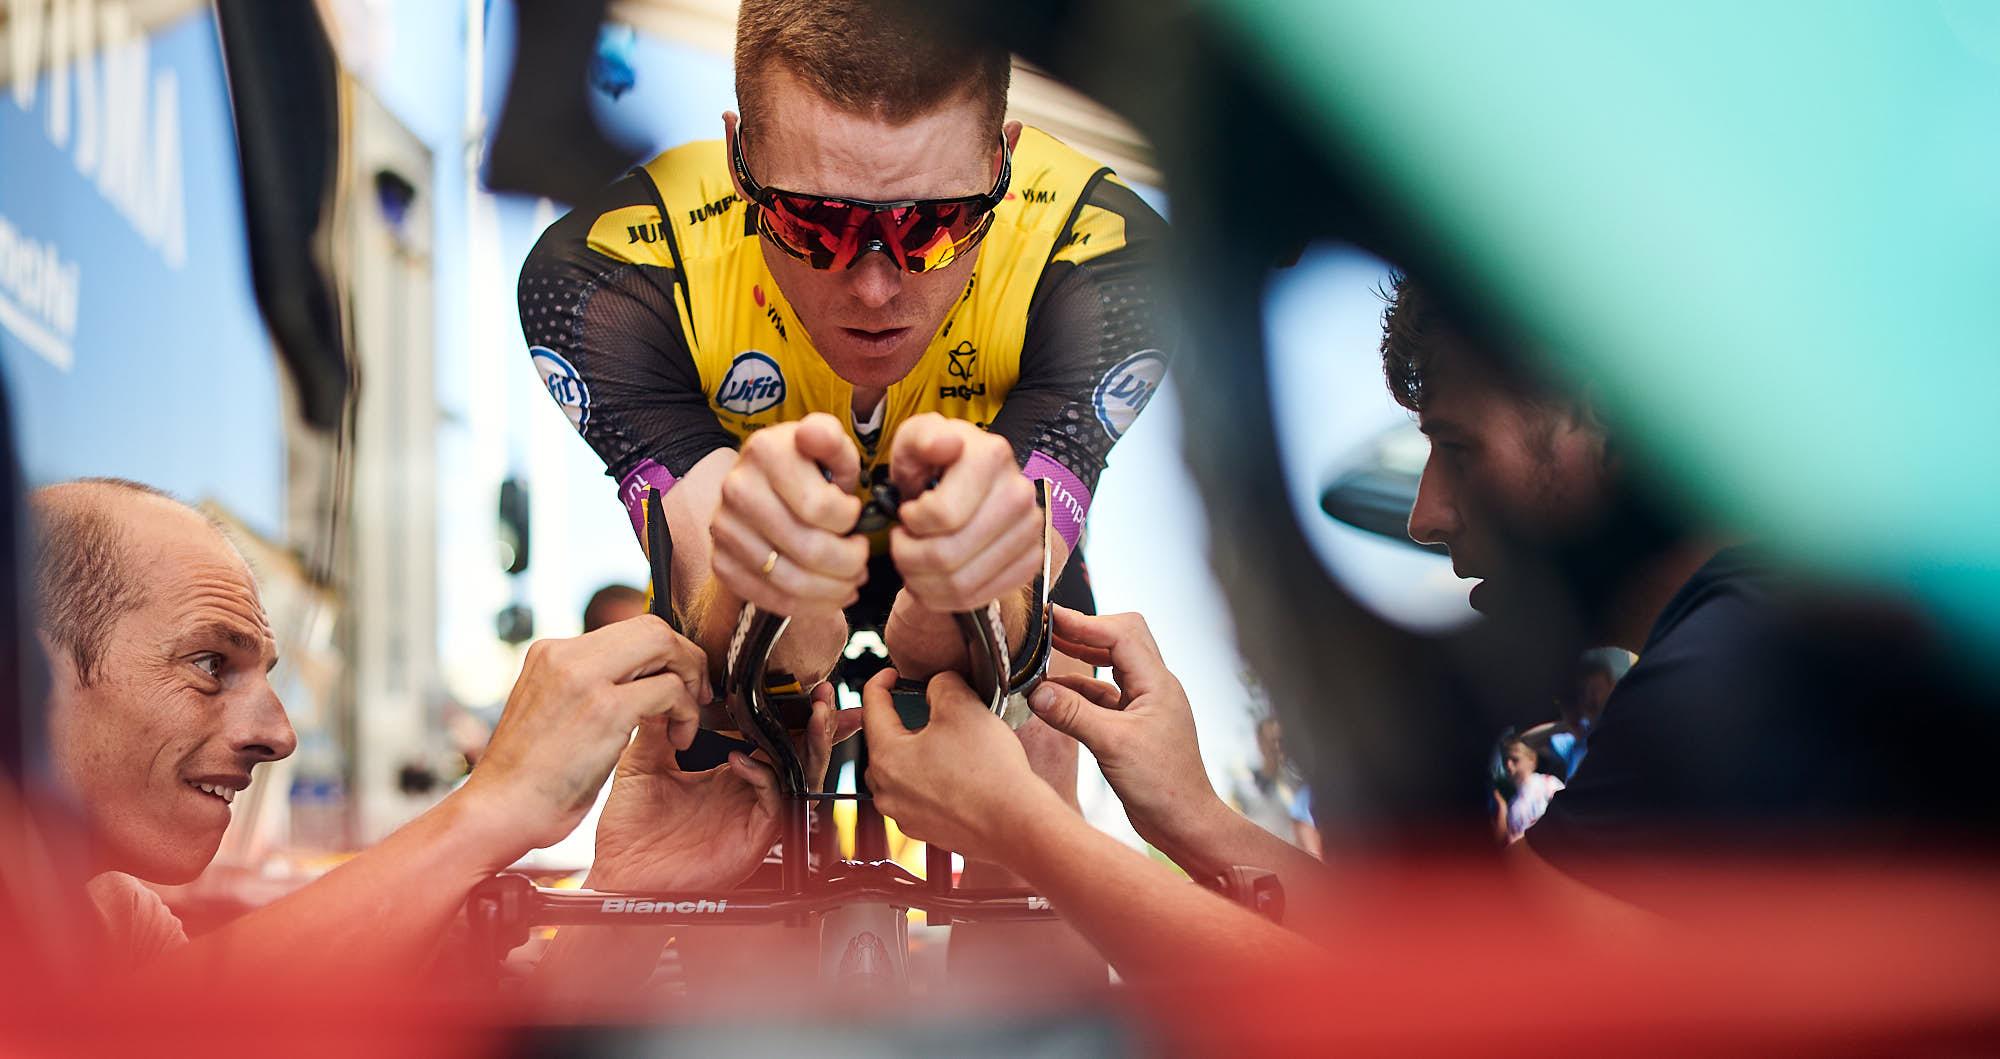 Steven Kruijswijk and Jumbo-Visma staff fine-tuning the cyclist's time trial bike